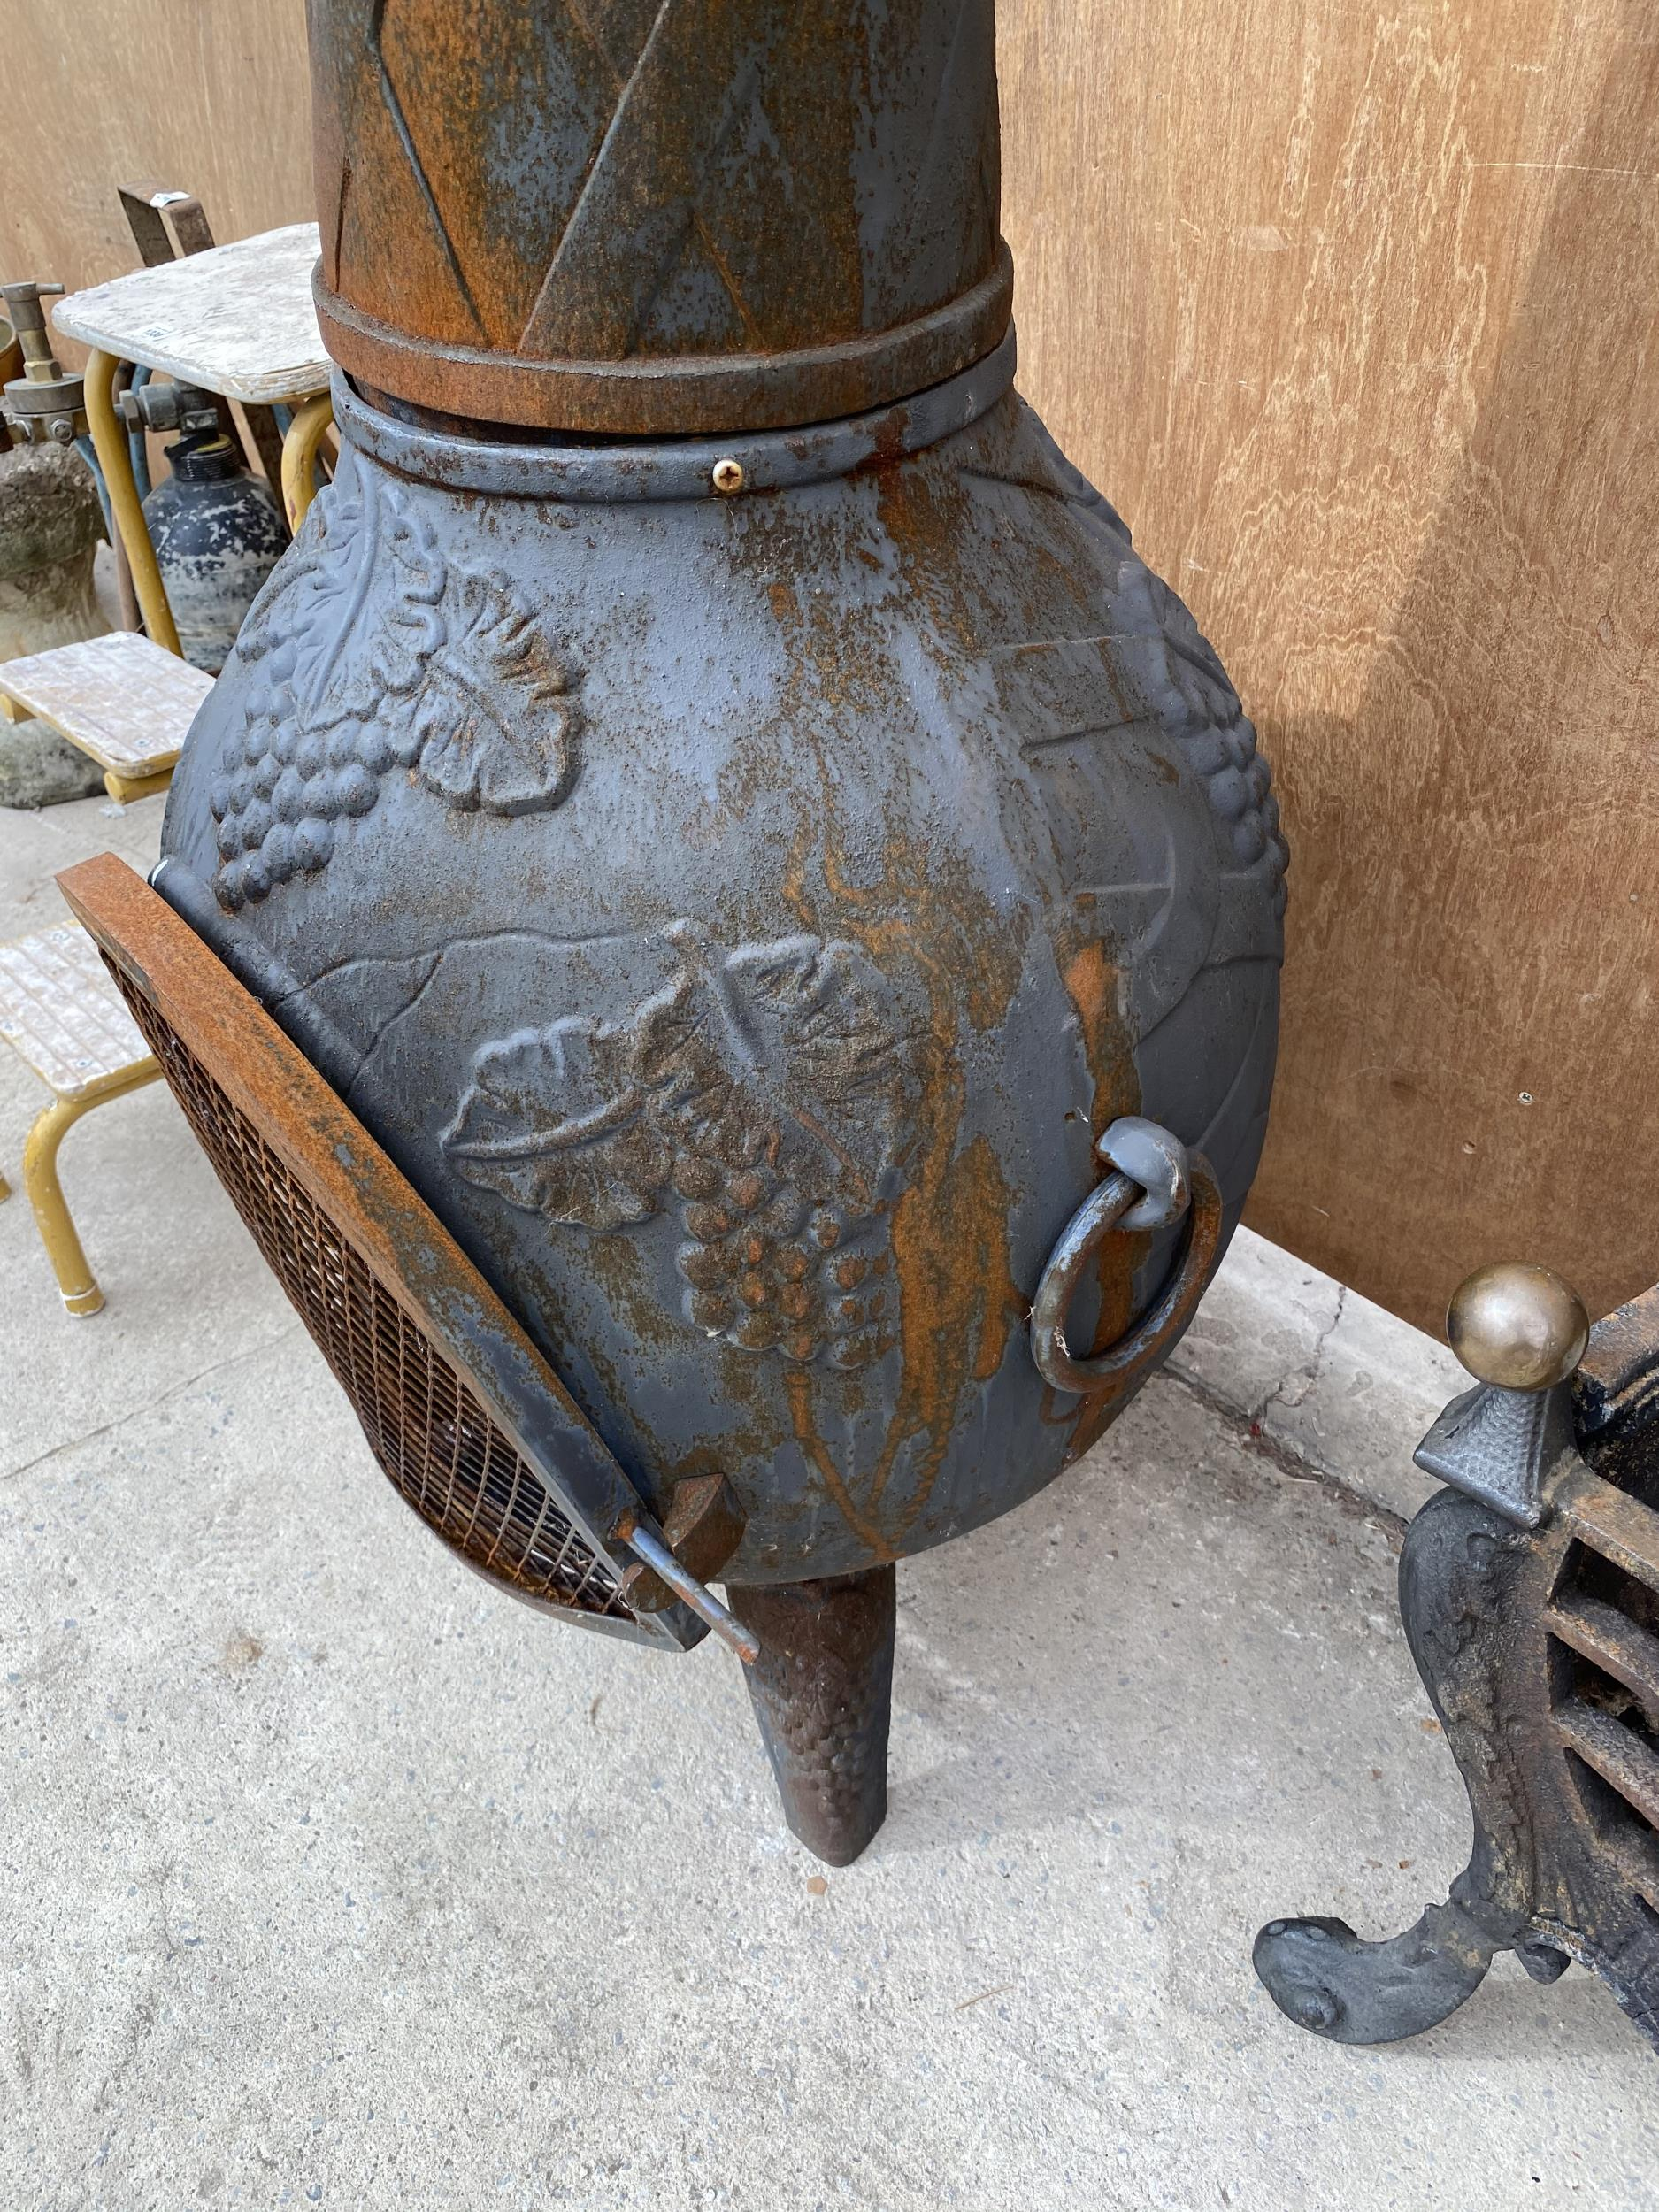 A DECORATIVE CAST IRON GARDEN CHIMENEA - Image 3 of 6